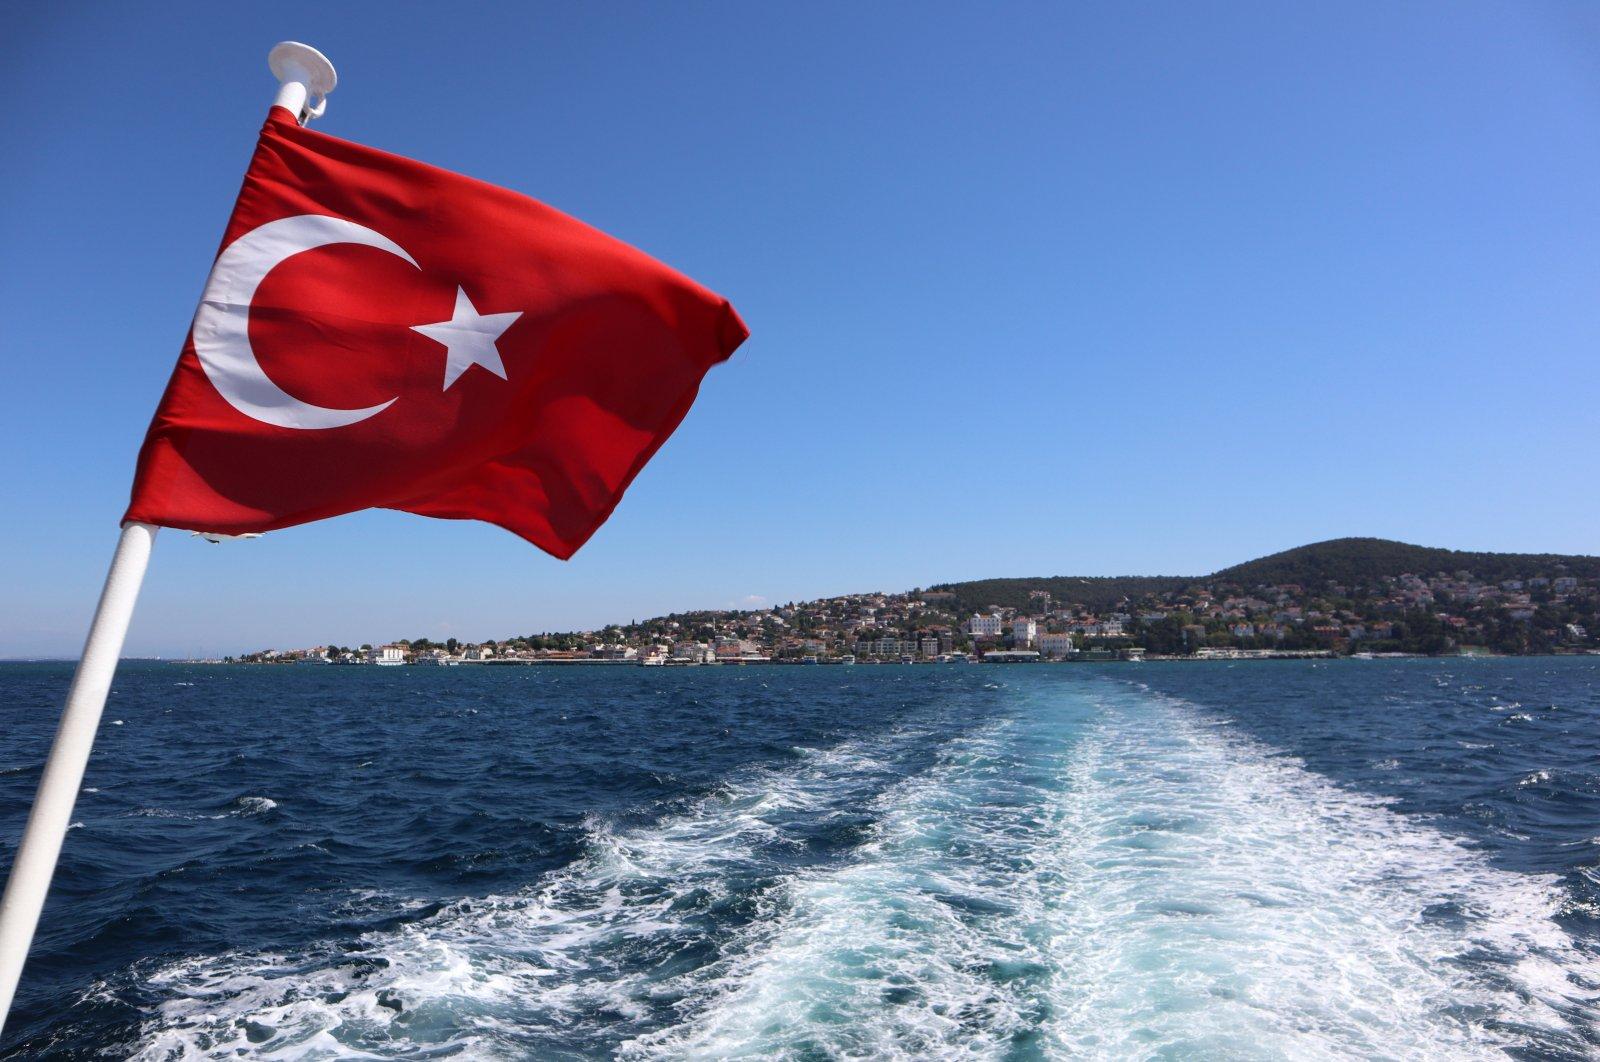 The Turkish flag waves on a Bosporus ferry from Büyükada in the Marmara Sea, Istanbul, Turkey, March 12, 2019. (Photo by Shutterstock)